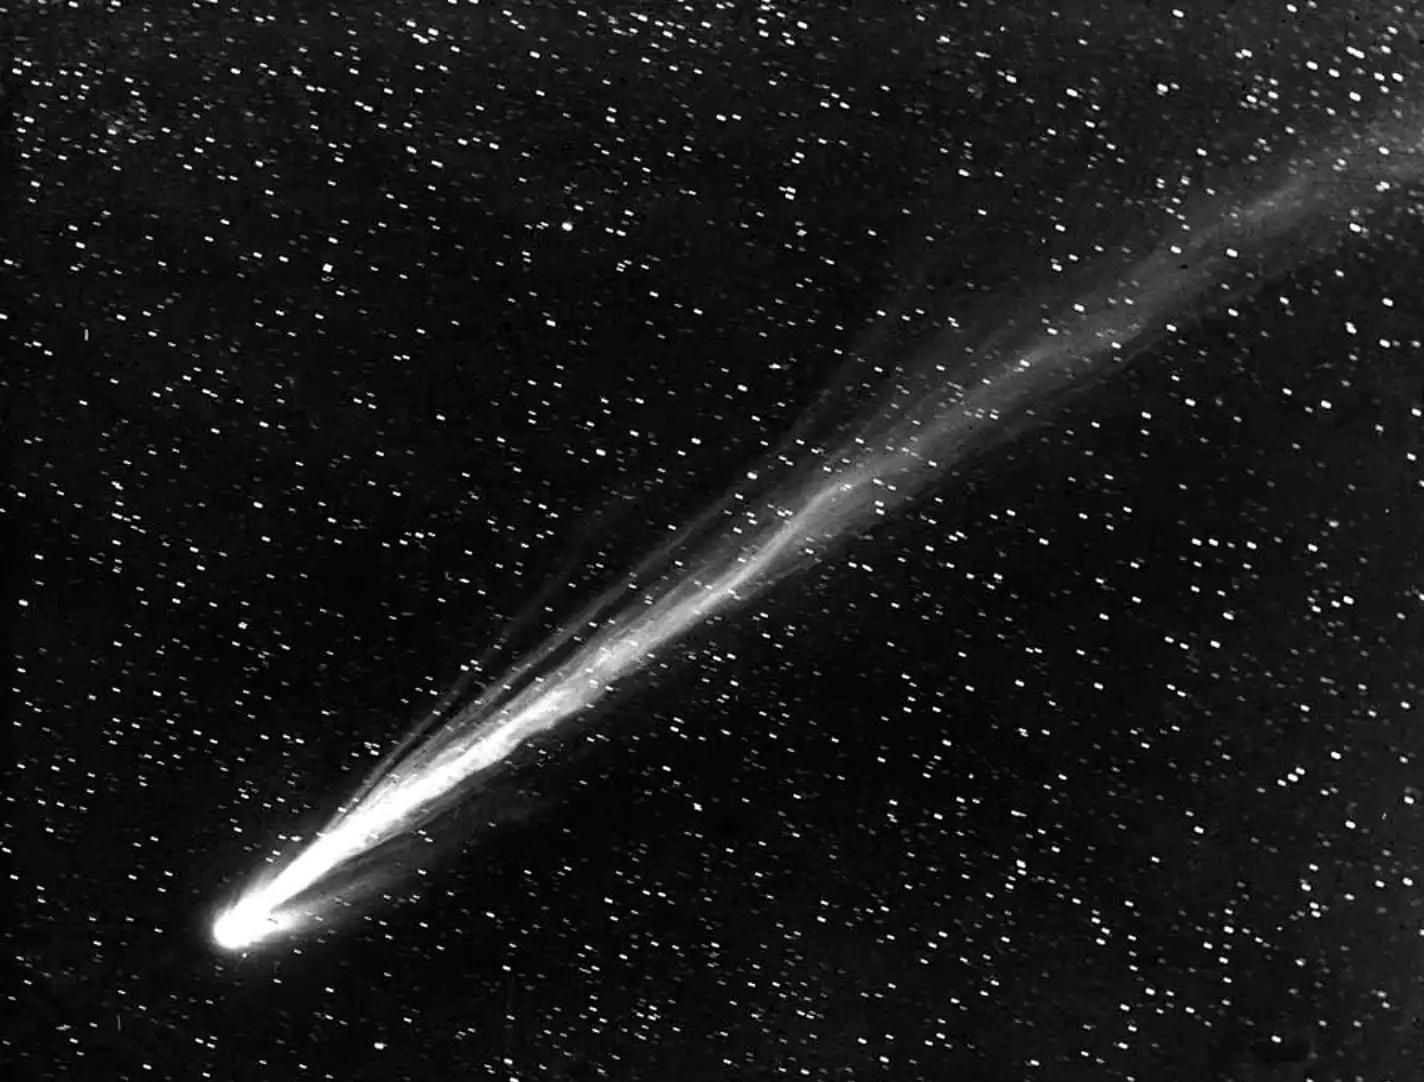 Комета Морхауза (C/908 R1)